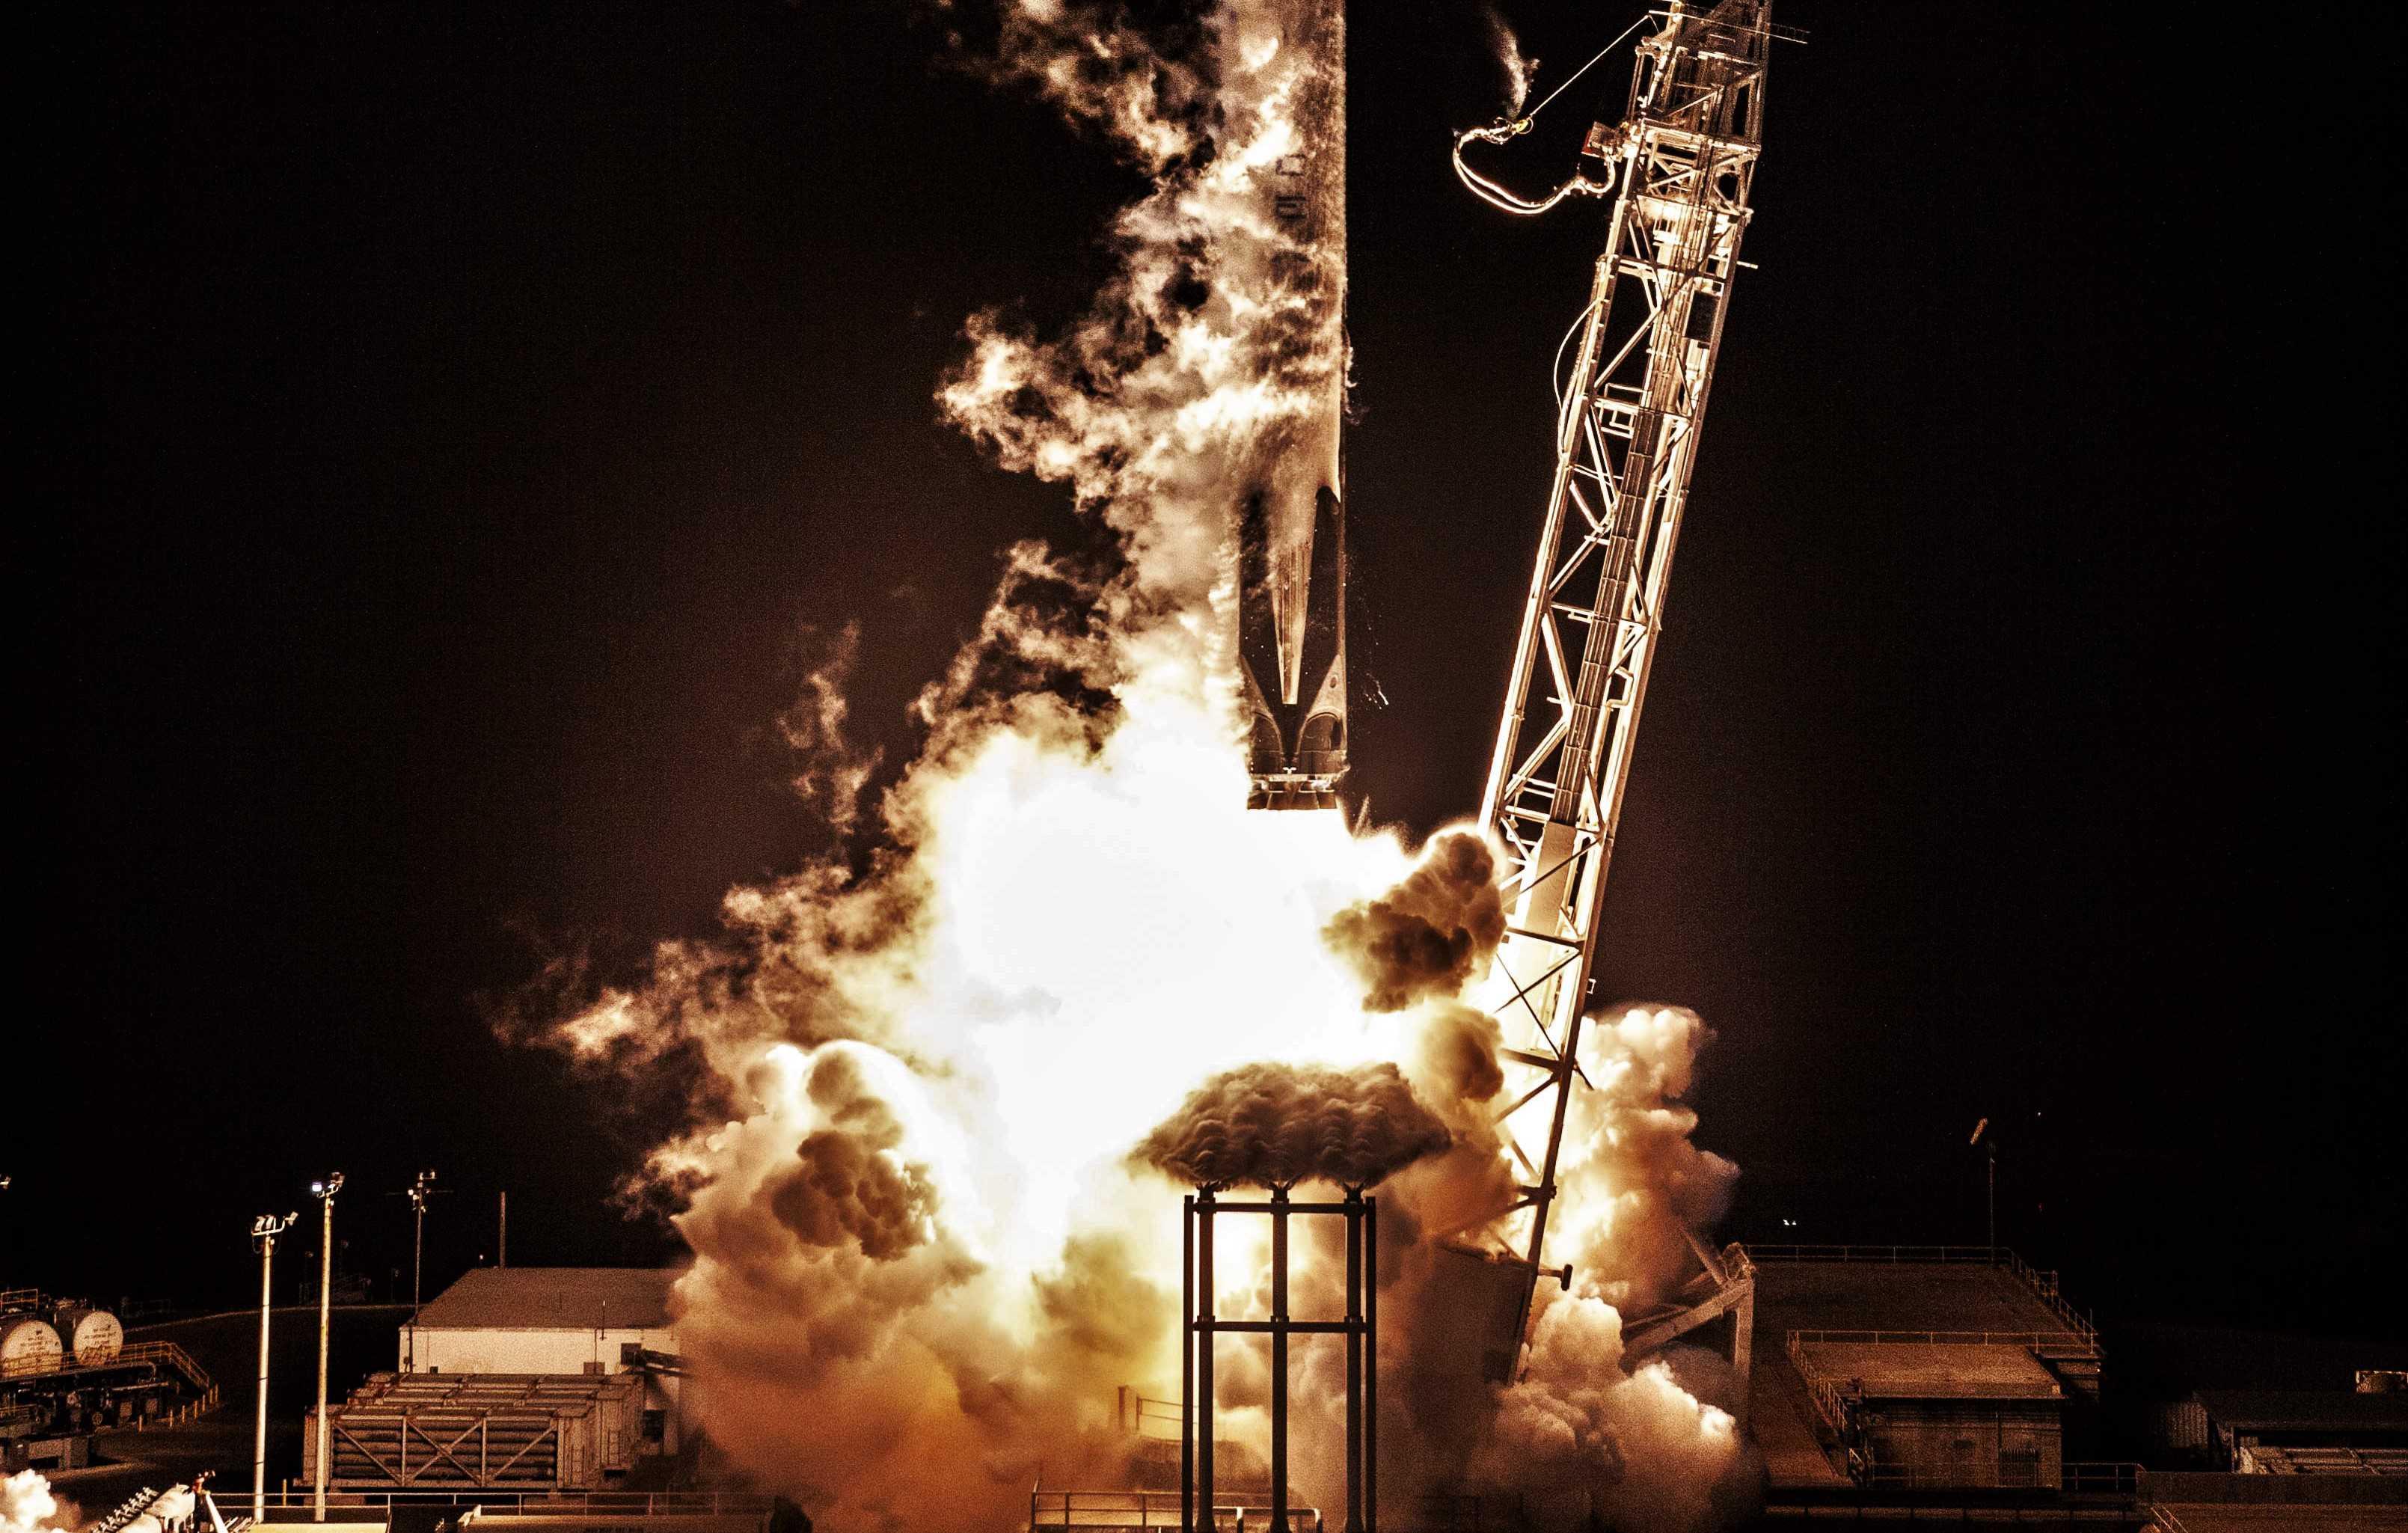 B1048.2 launch SAOCOM 1A (SpaceX) crop(c)